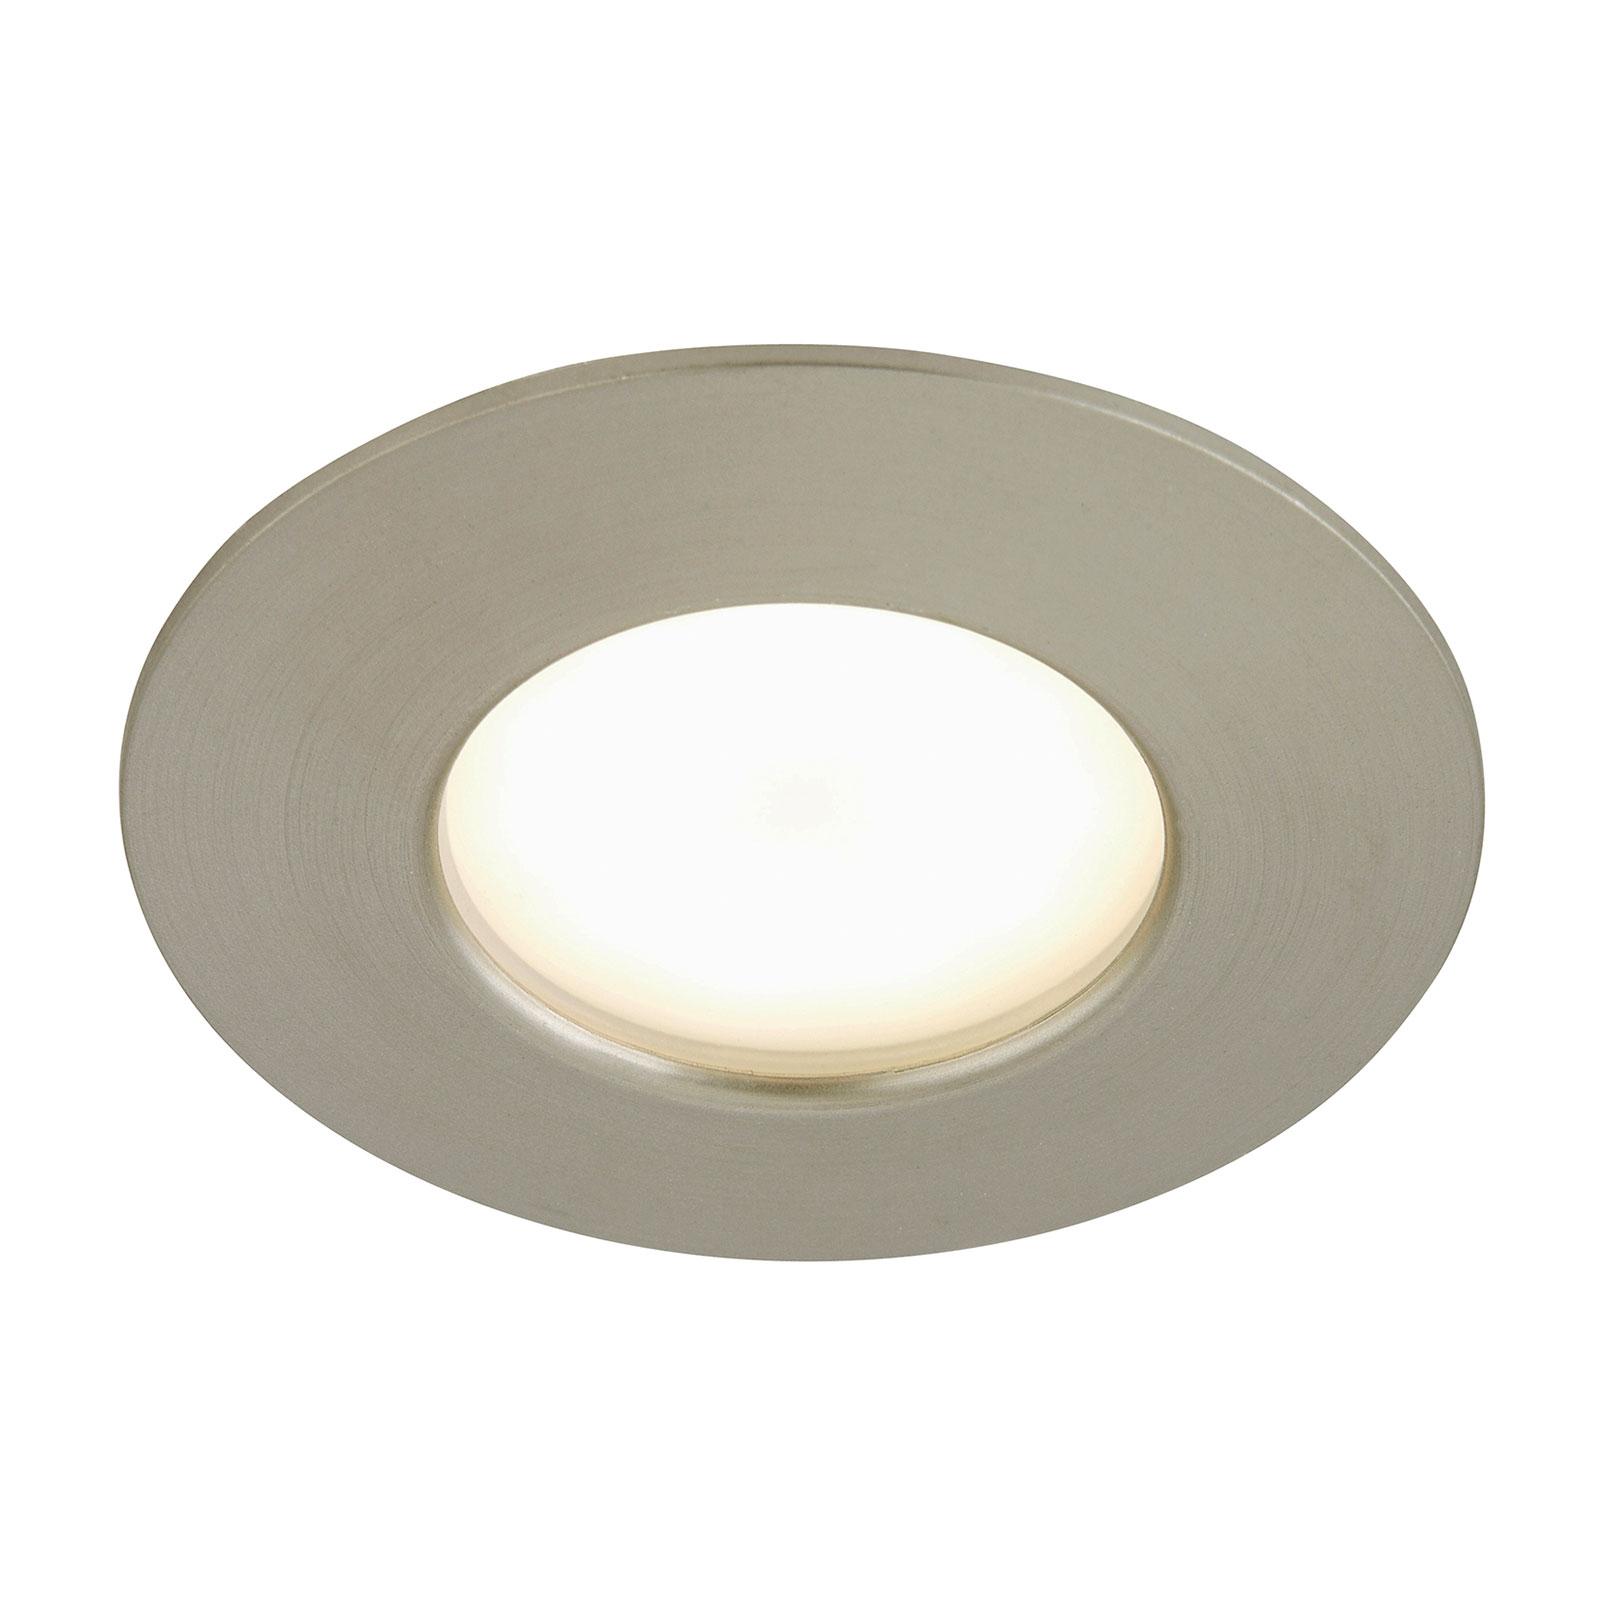 Felia - Spot LED incasso IP44, nichel satinato